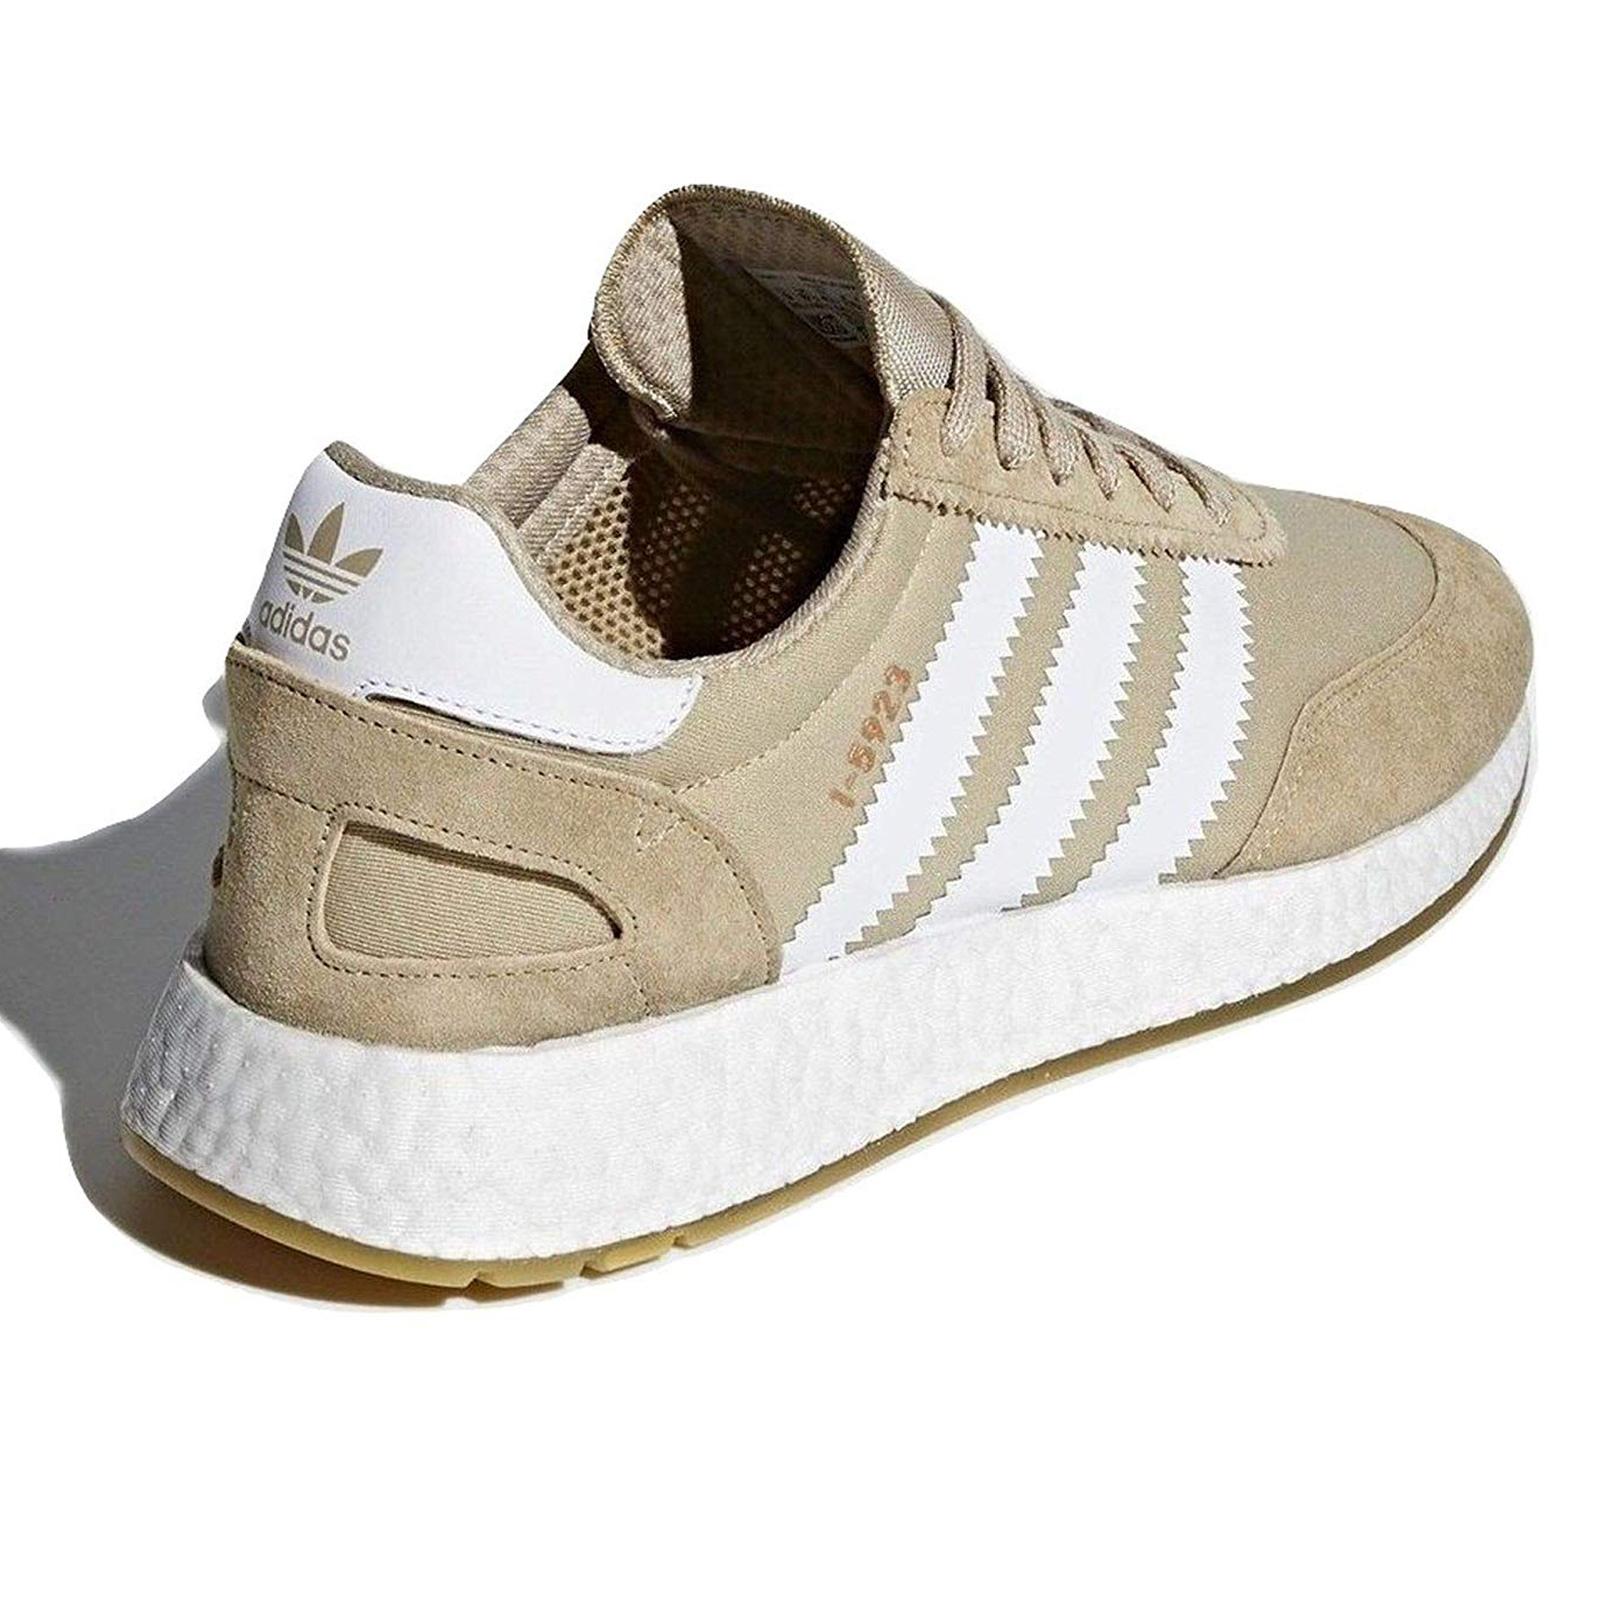 Details zu adidas Iniki Runner I 5923 Sneaker Boost Sohle Turnschuhe Raw Gold Beige B27874